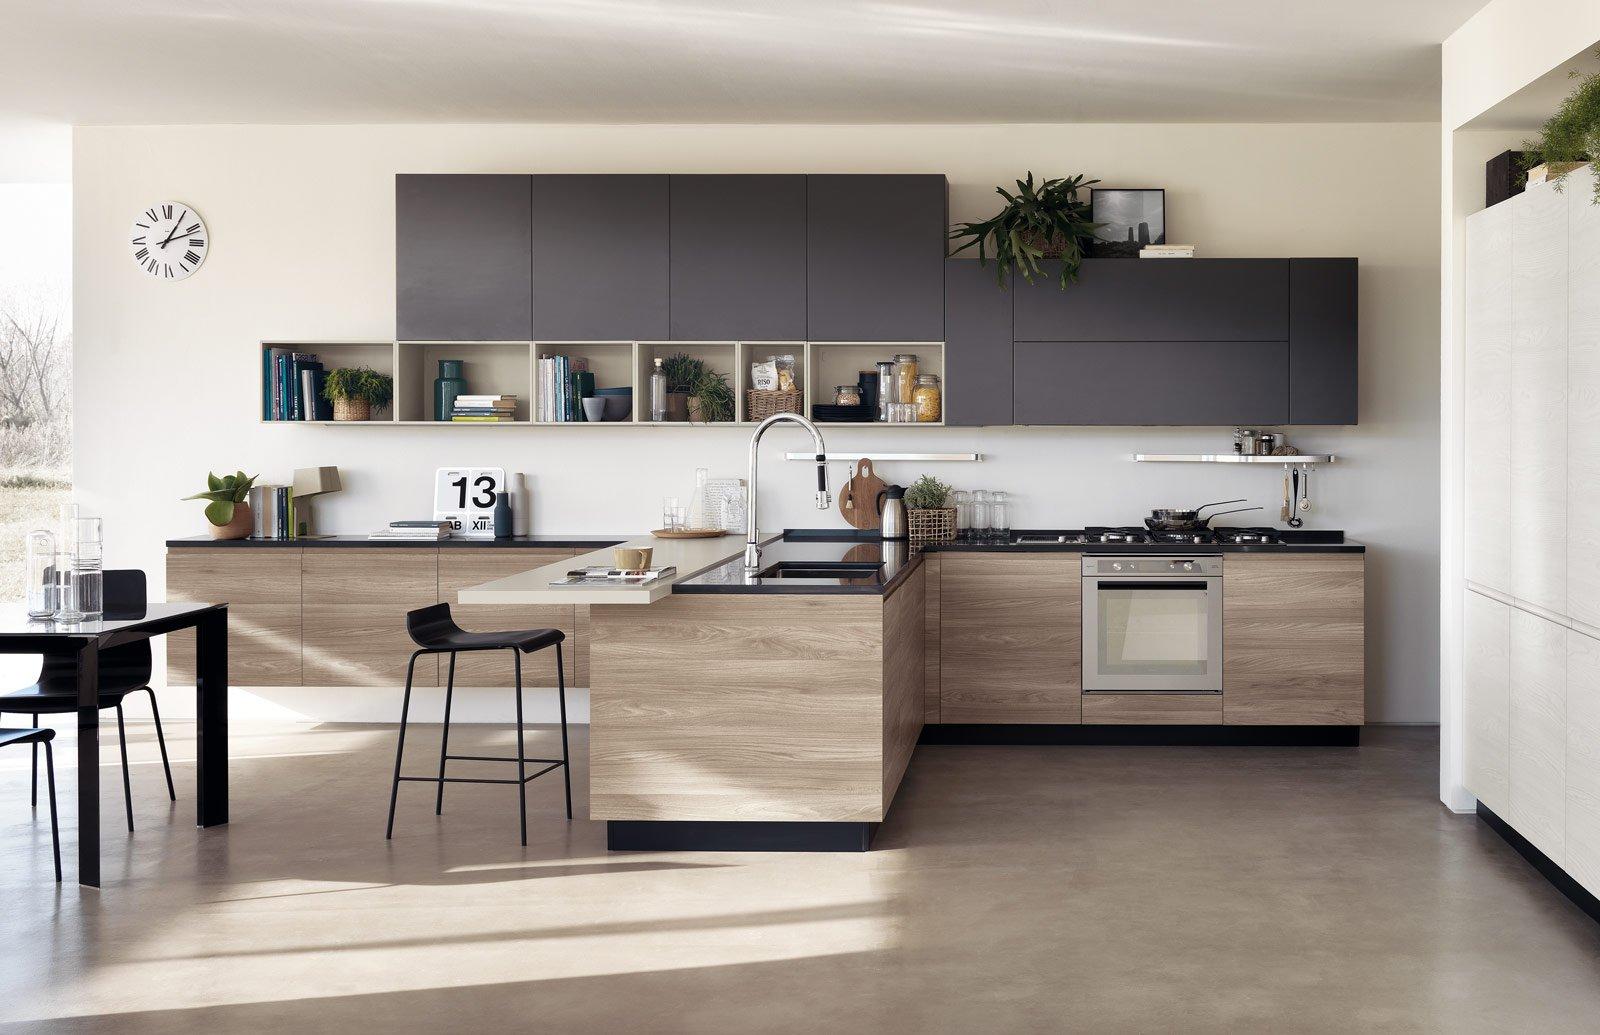 Best Mondo Convenienza Catalogo Cucine Photos - Ideas & Design ...